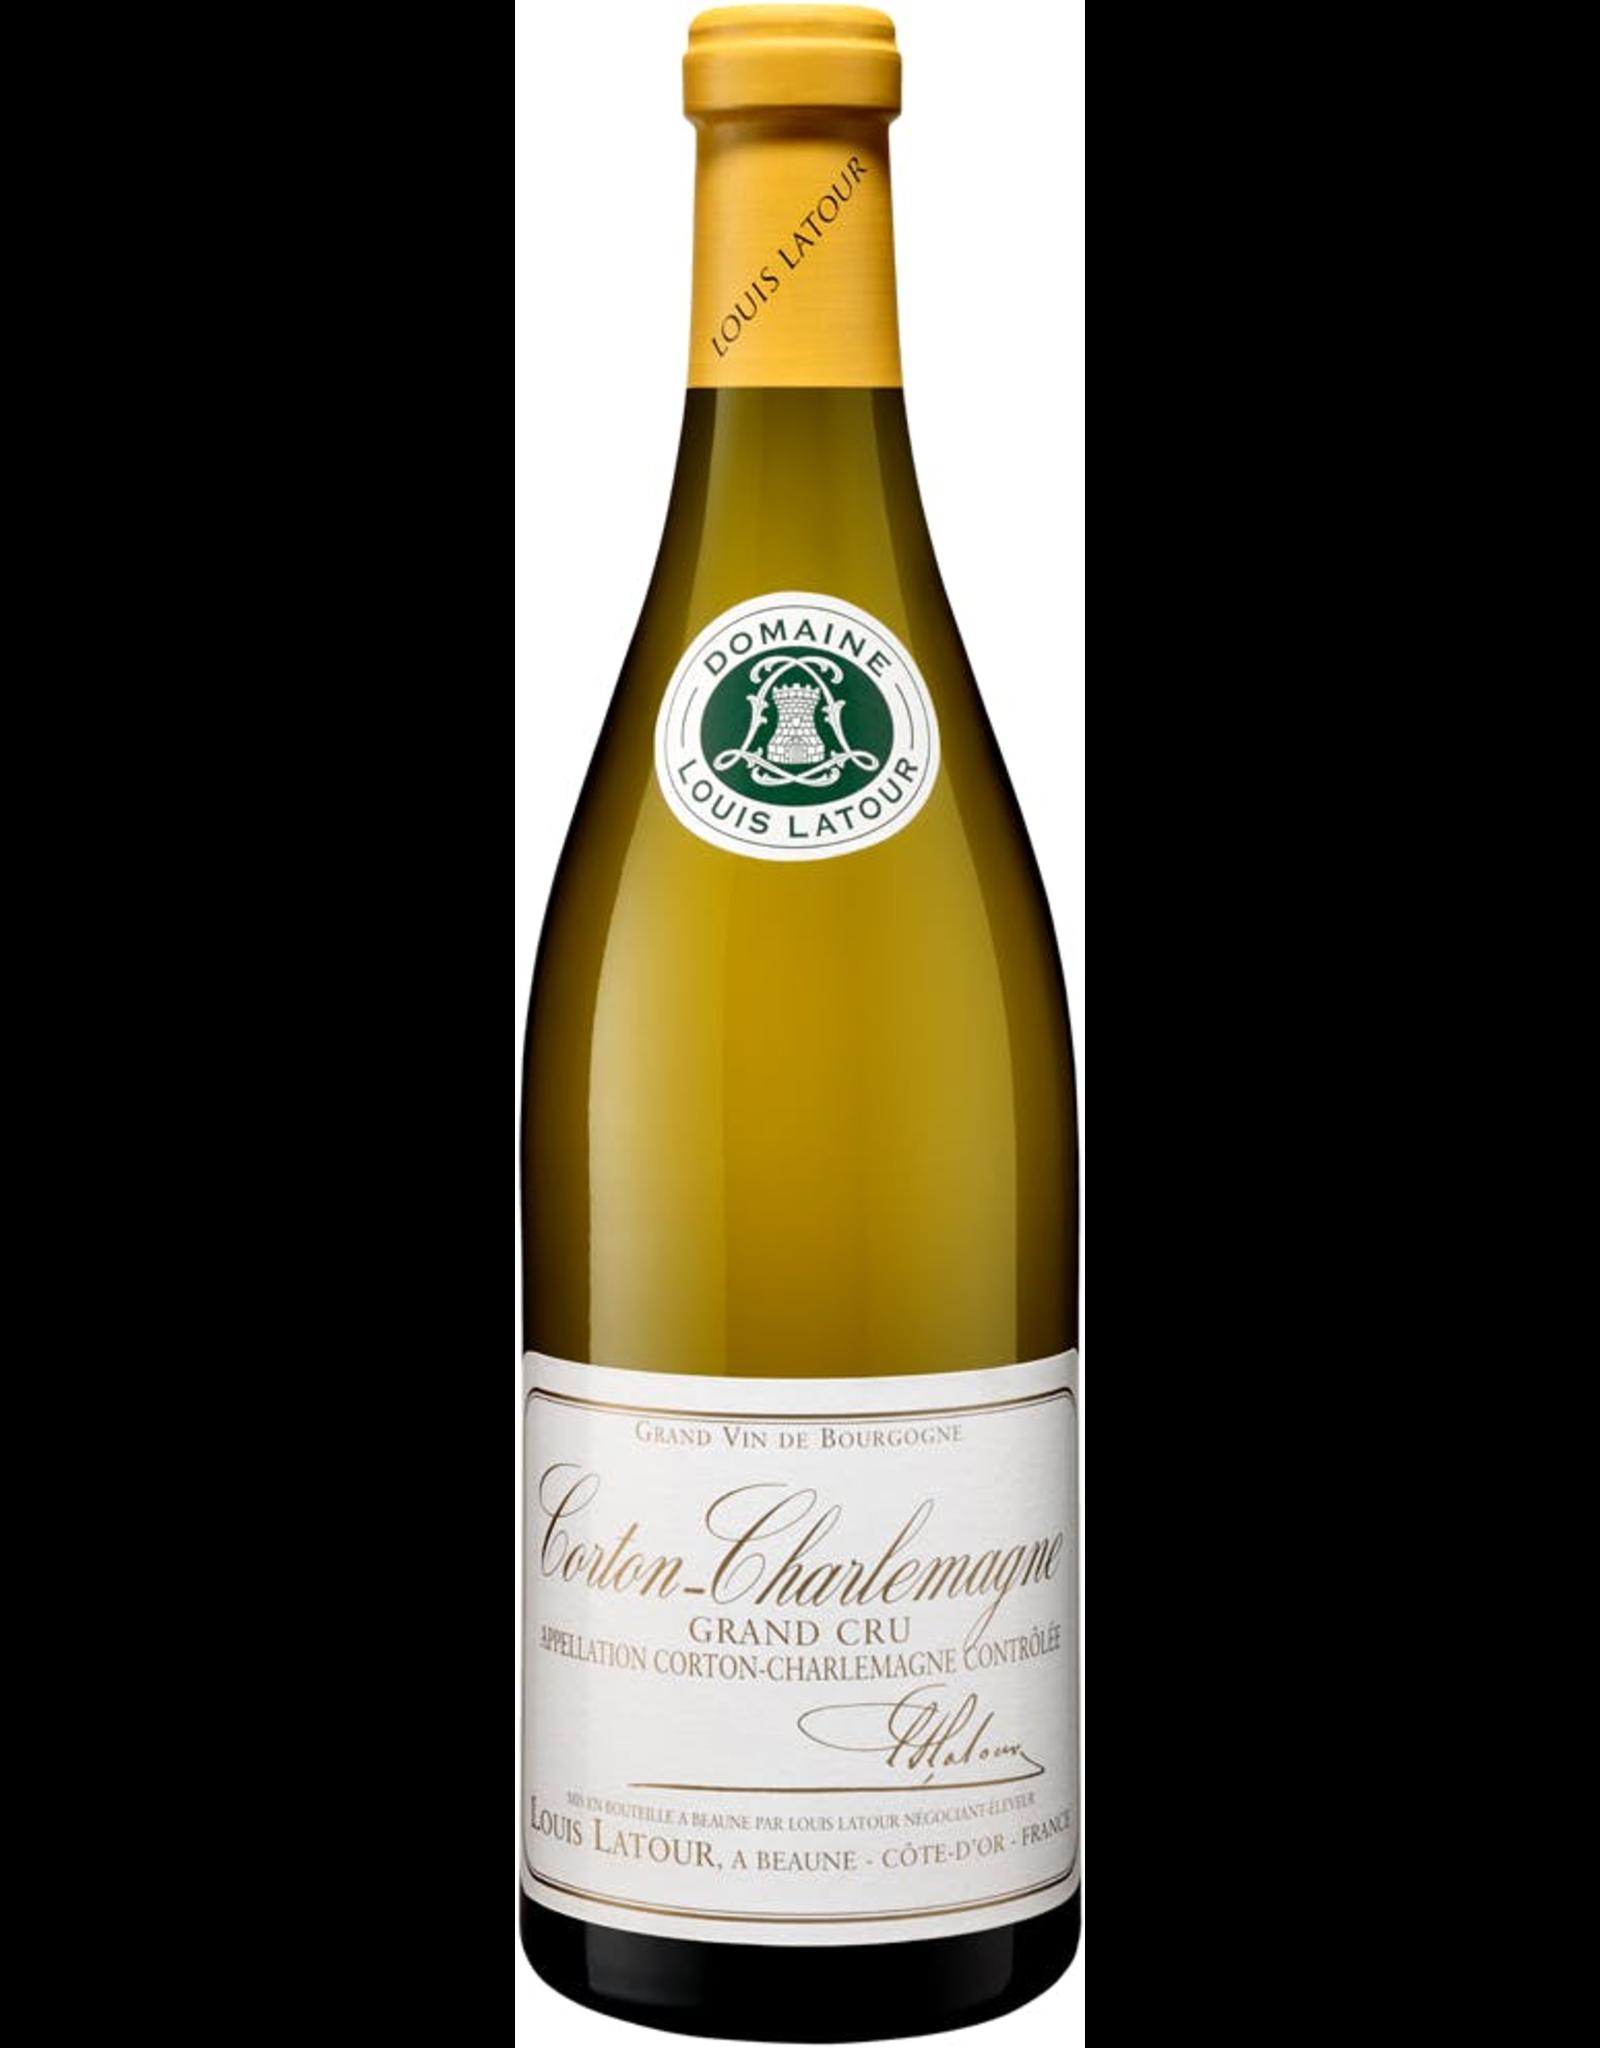 White Wine 2015, Louis Latour Corton-Charlemagne Crand Cru, Chardonnay, Corton-Charlemagne, Burgundy, France, 14.5% Alc, TWnr